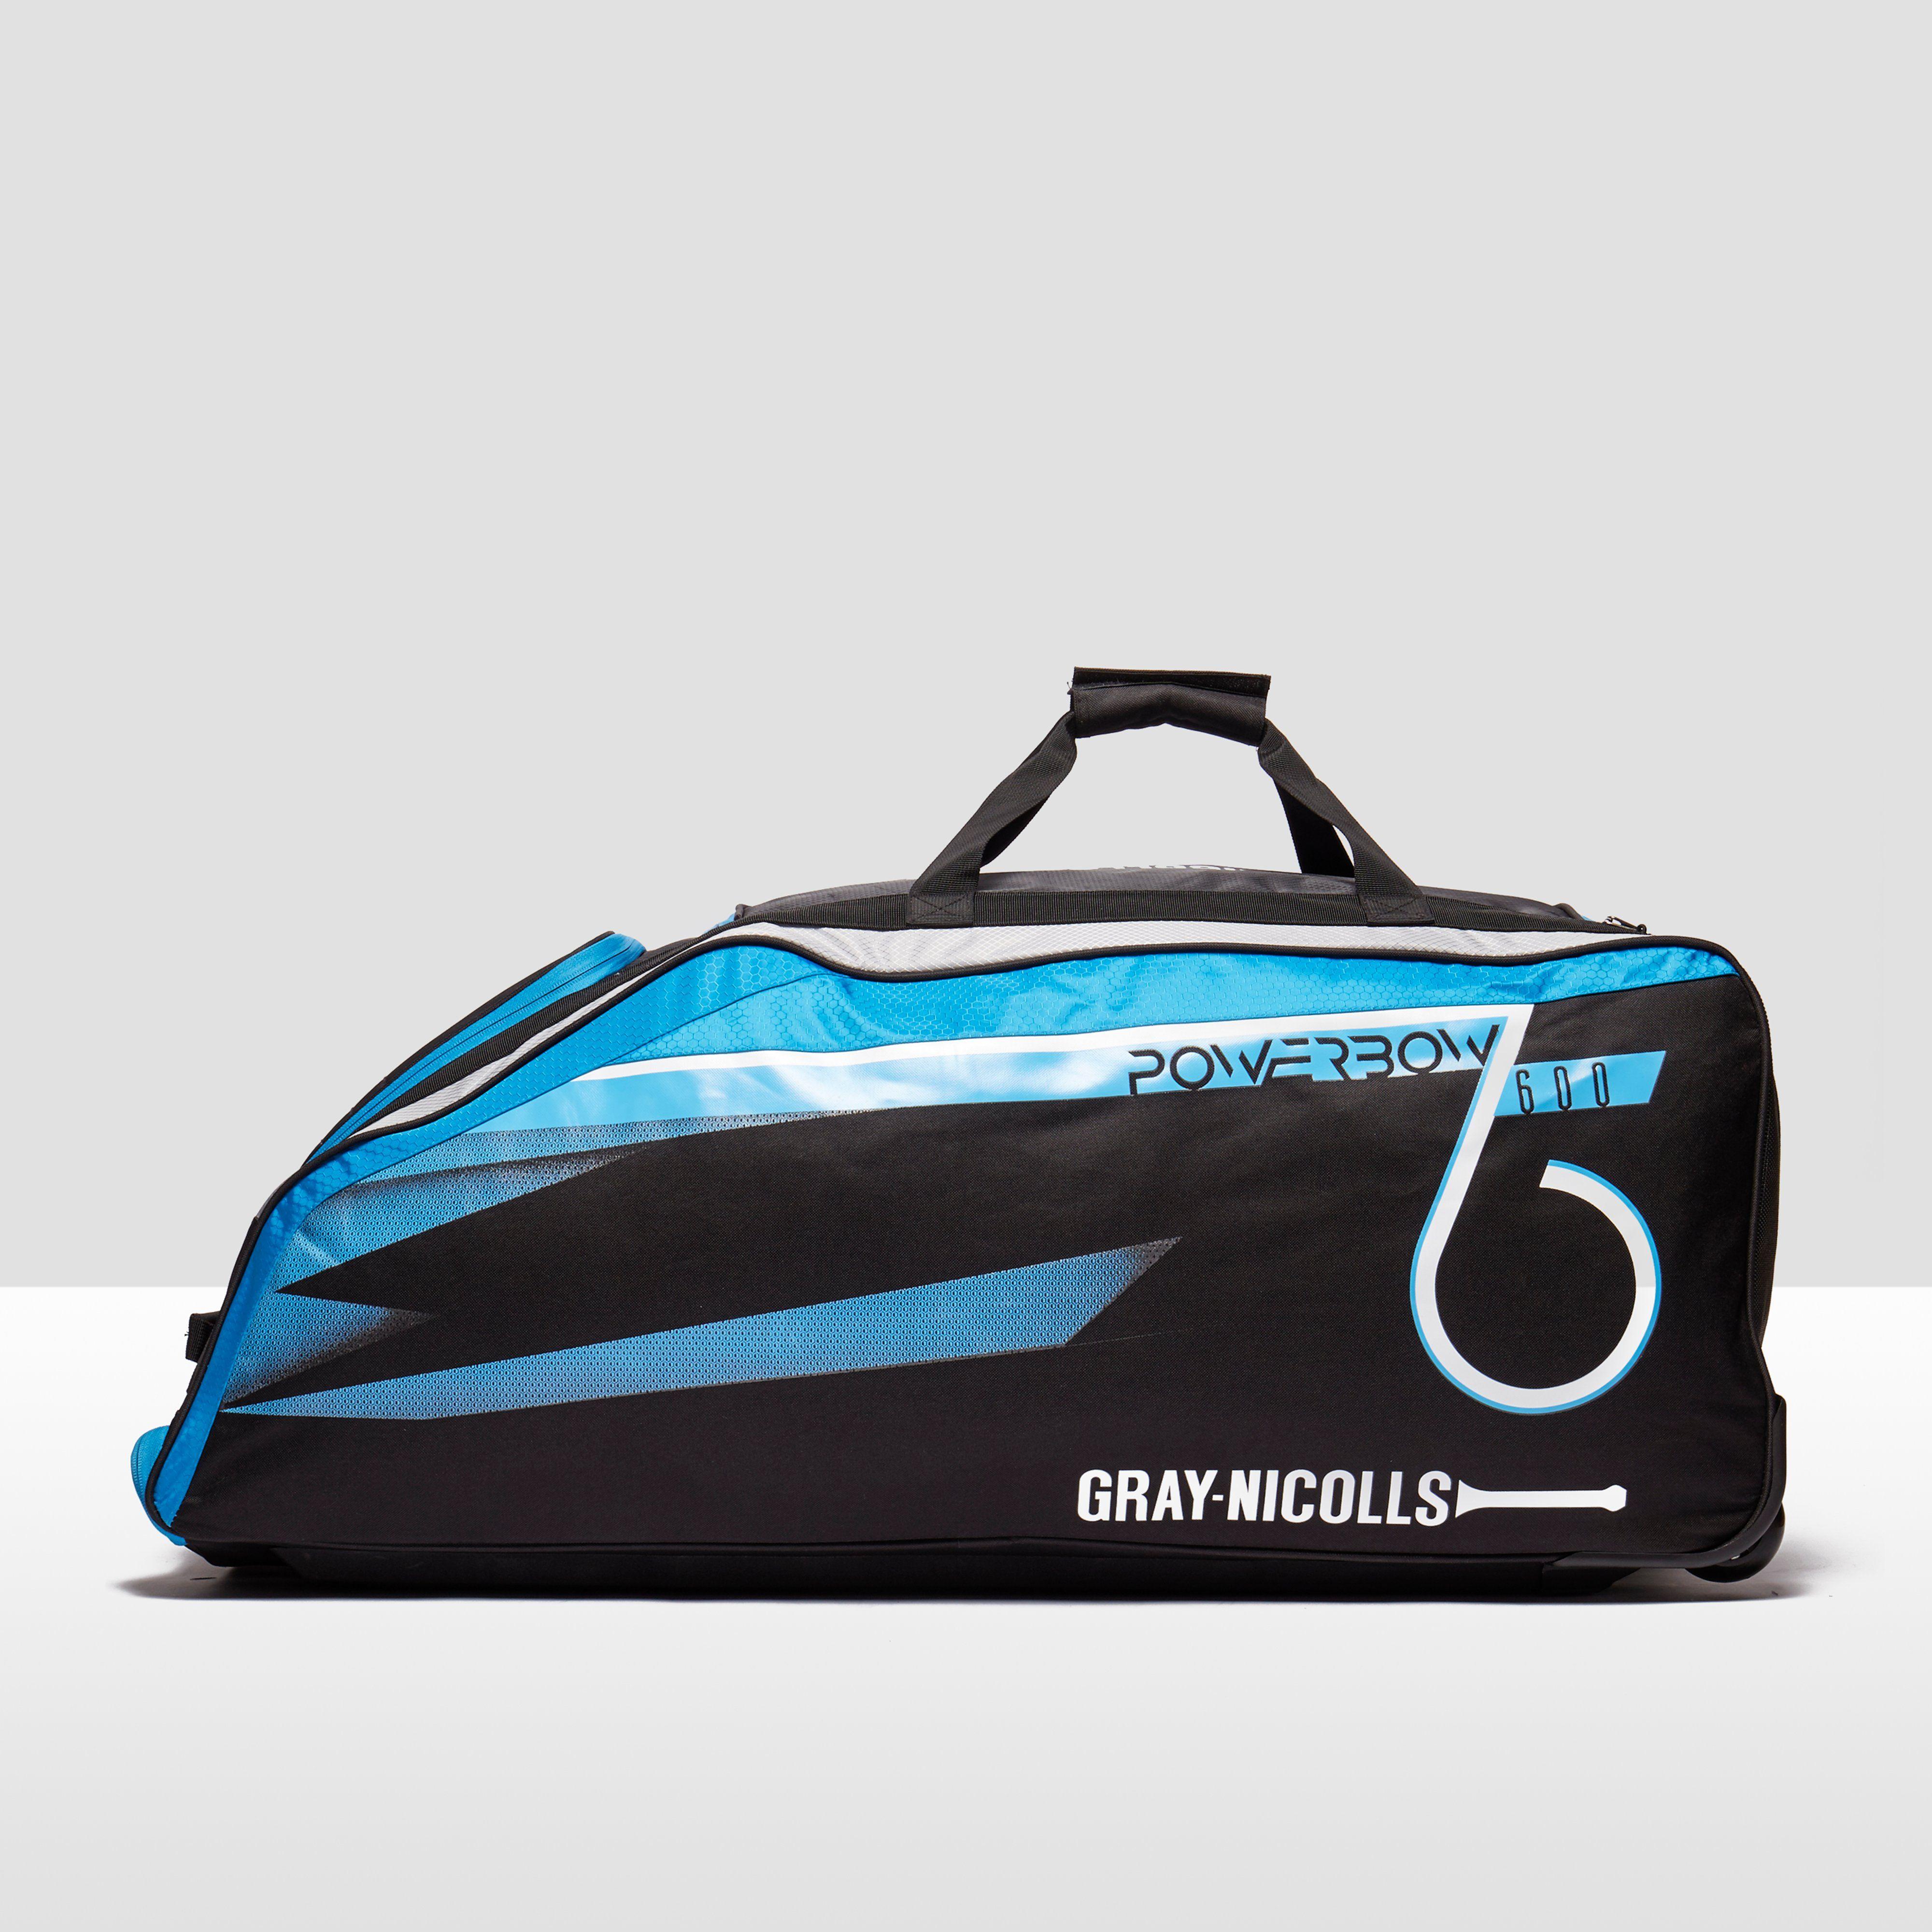 Gray Nicolls Powerbow 6 600 Cricket Bag